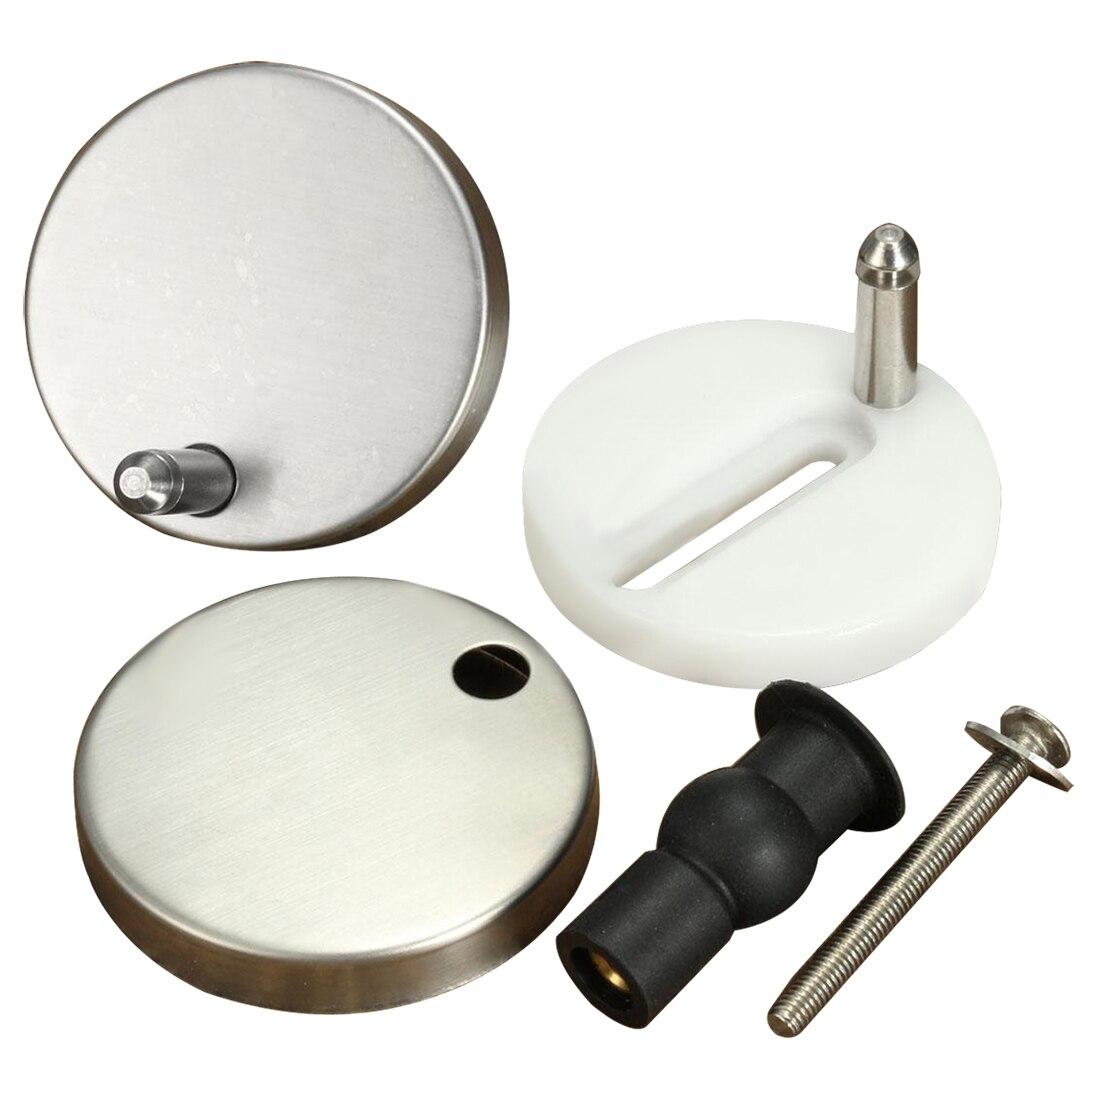 2pcs New Sets Toilet Seat Screws Top Fix Hinge Pack Repair Tool Replacement repair parts replacement stainless steel screws pack for iphone 4 40 piece pack